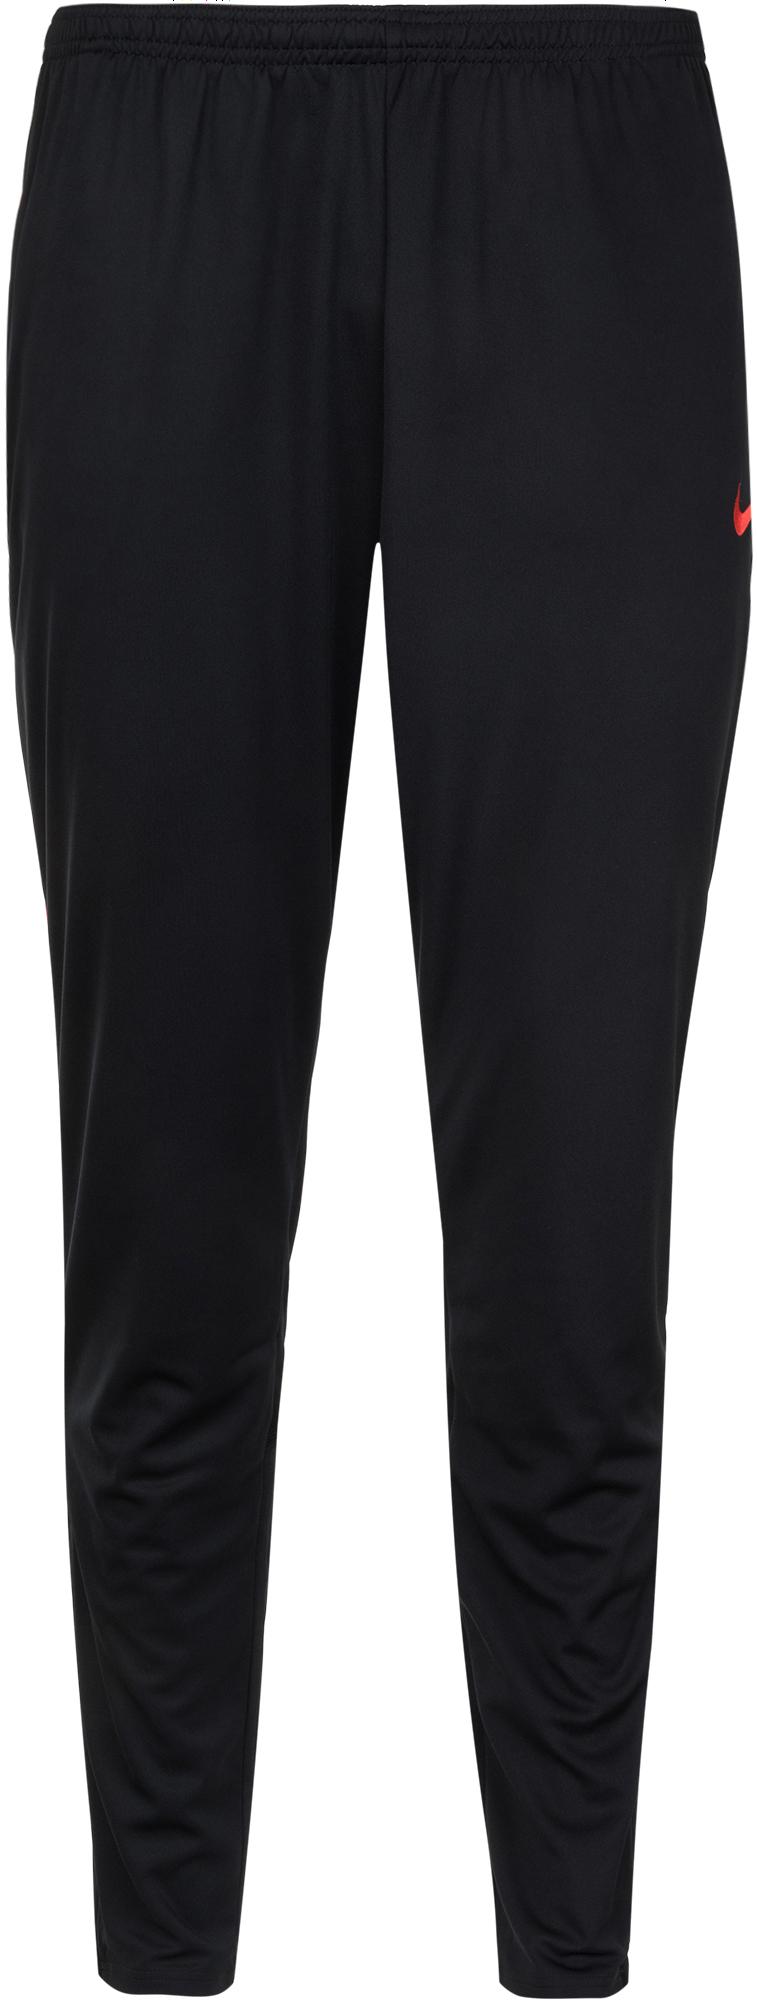 Nike Брюки мужские Nike Dry, размер 50-52 цена